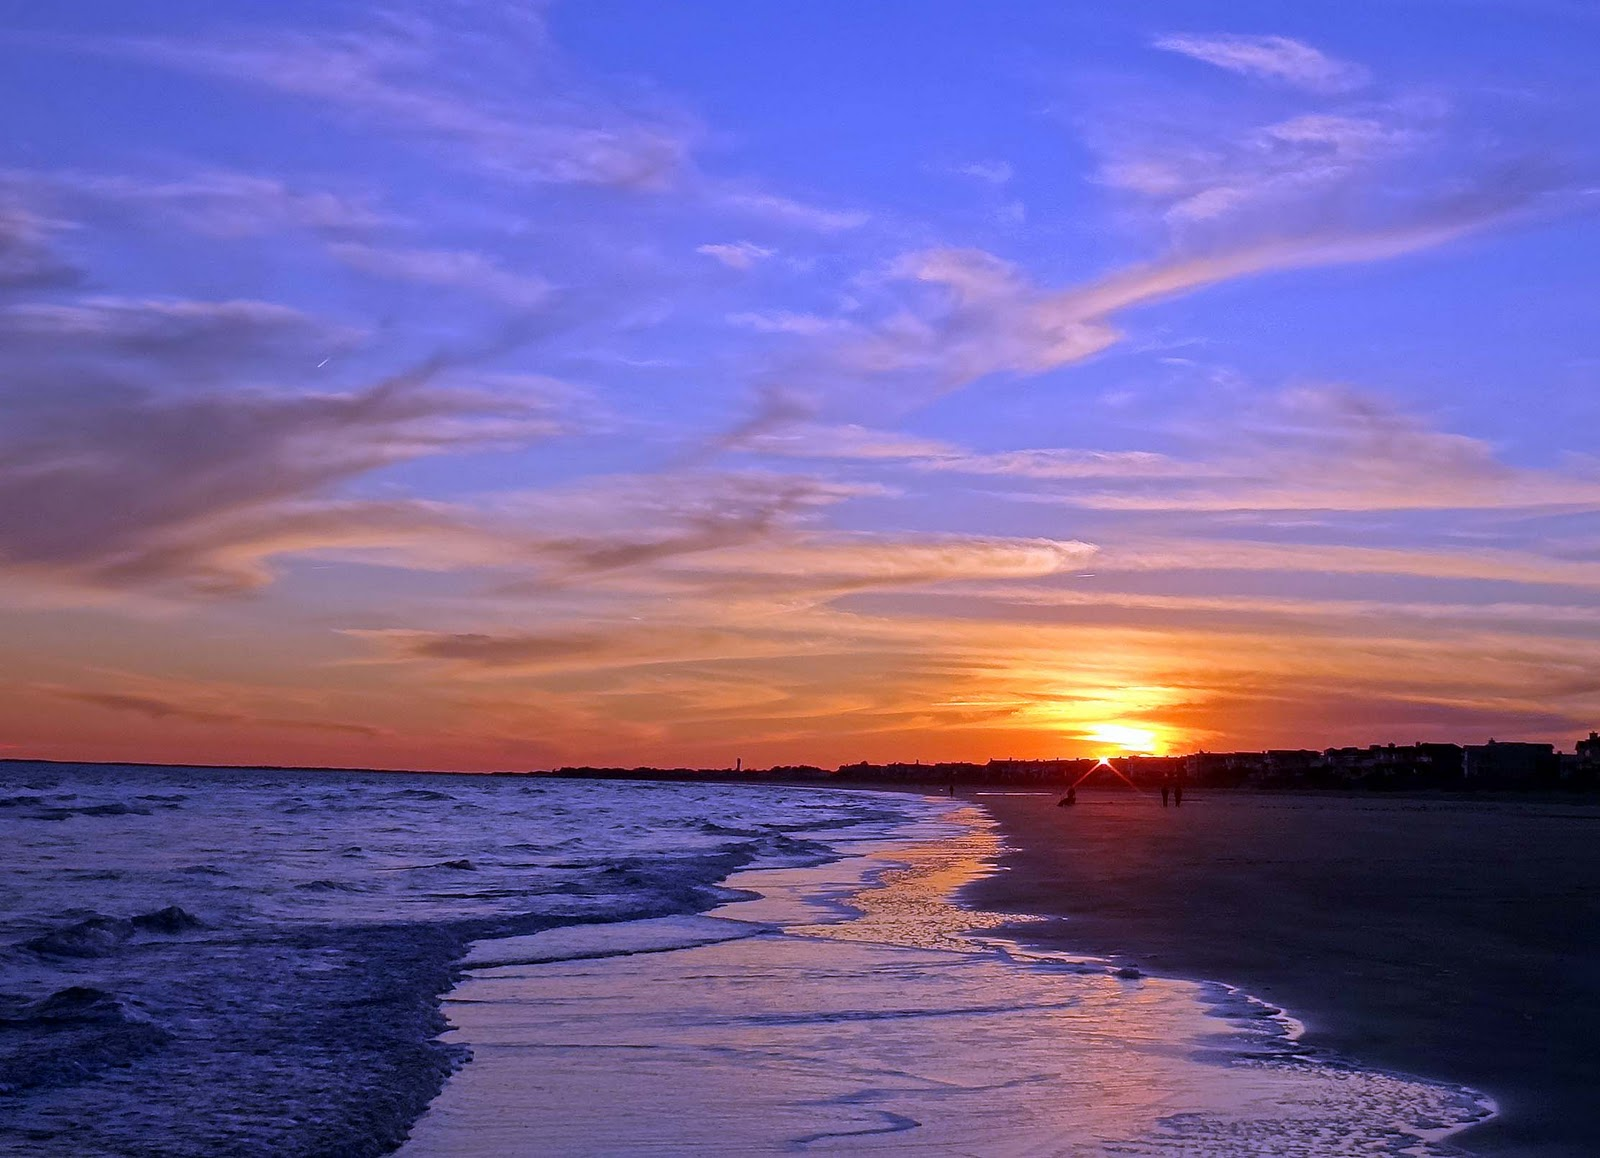 Joe S Retirement Blog Beach At Sunset Isle Of Palms